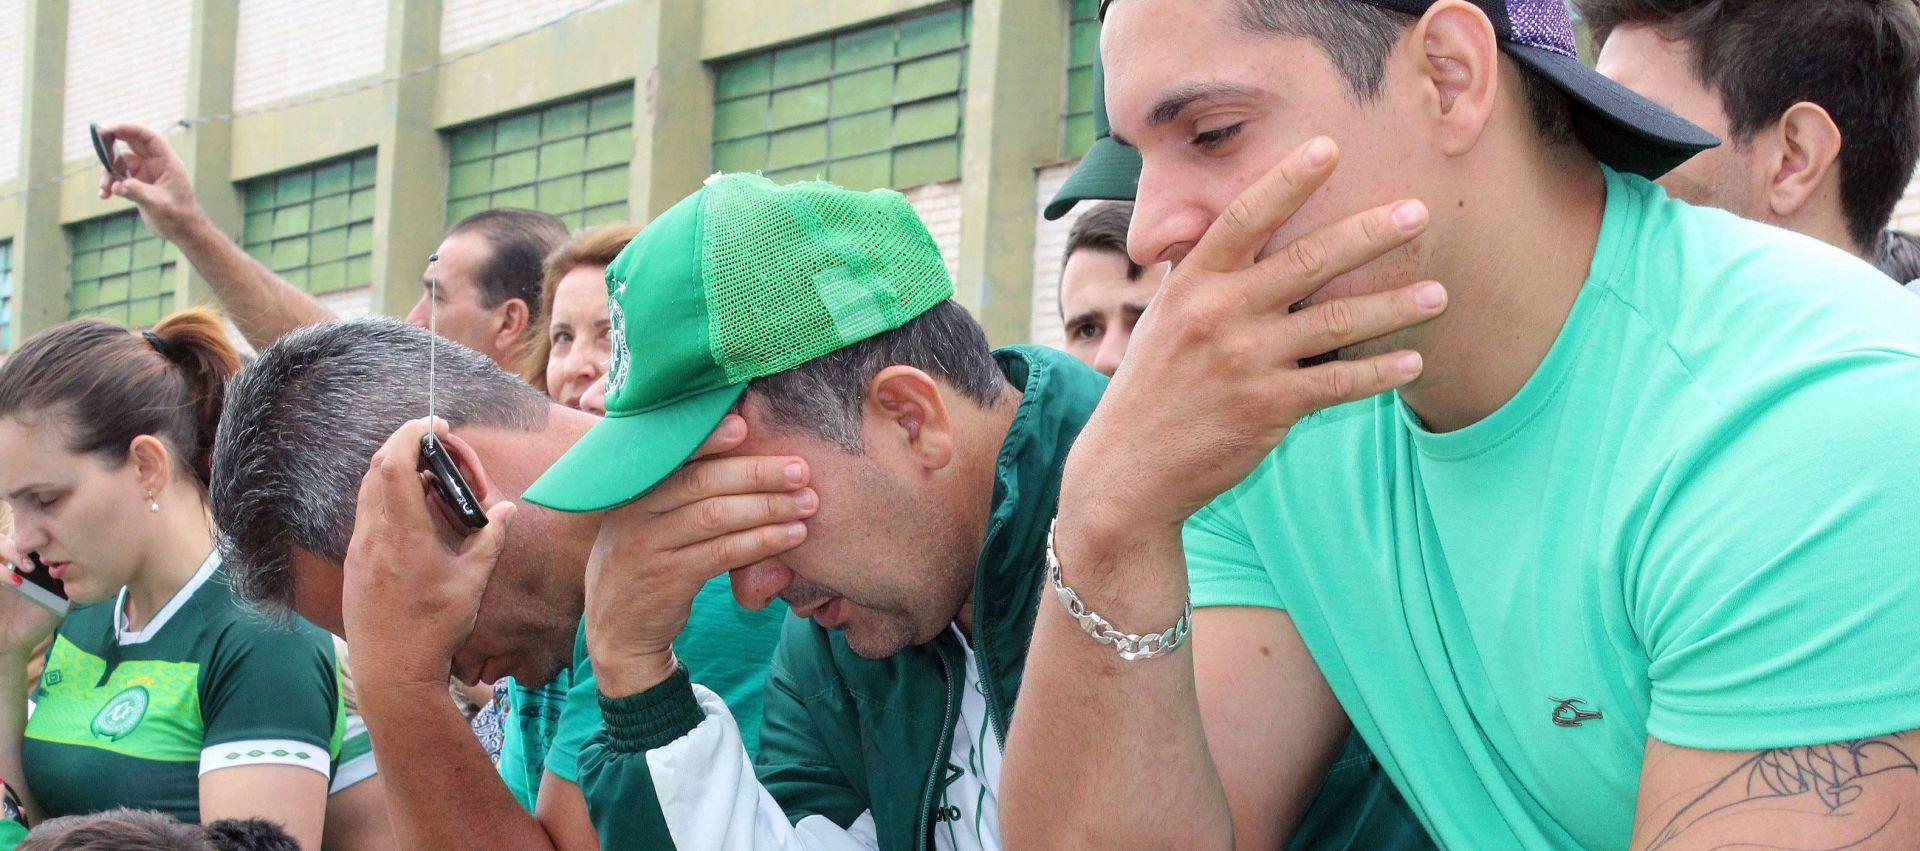 'El clasico' i ostale utakmice španjolskog prvenstva počinju minutom šutnje